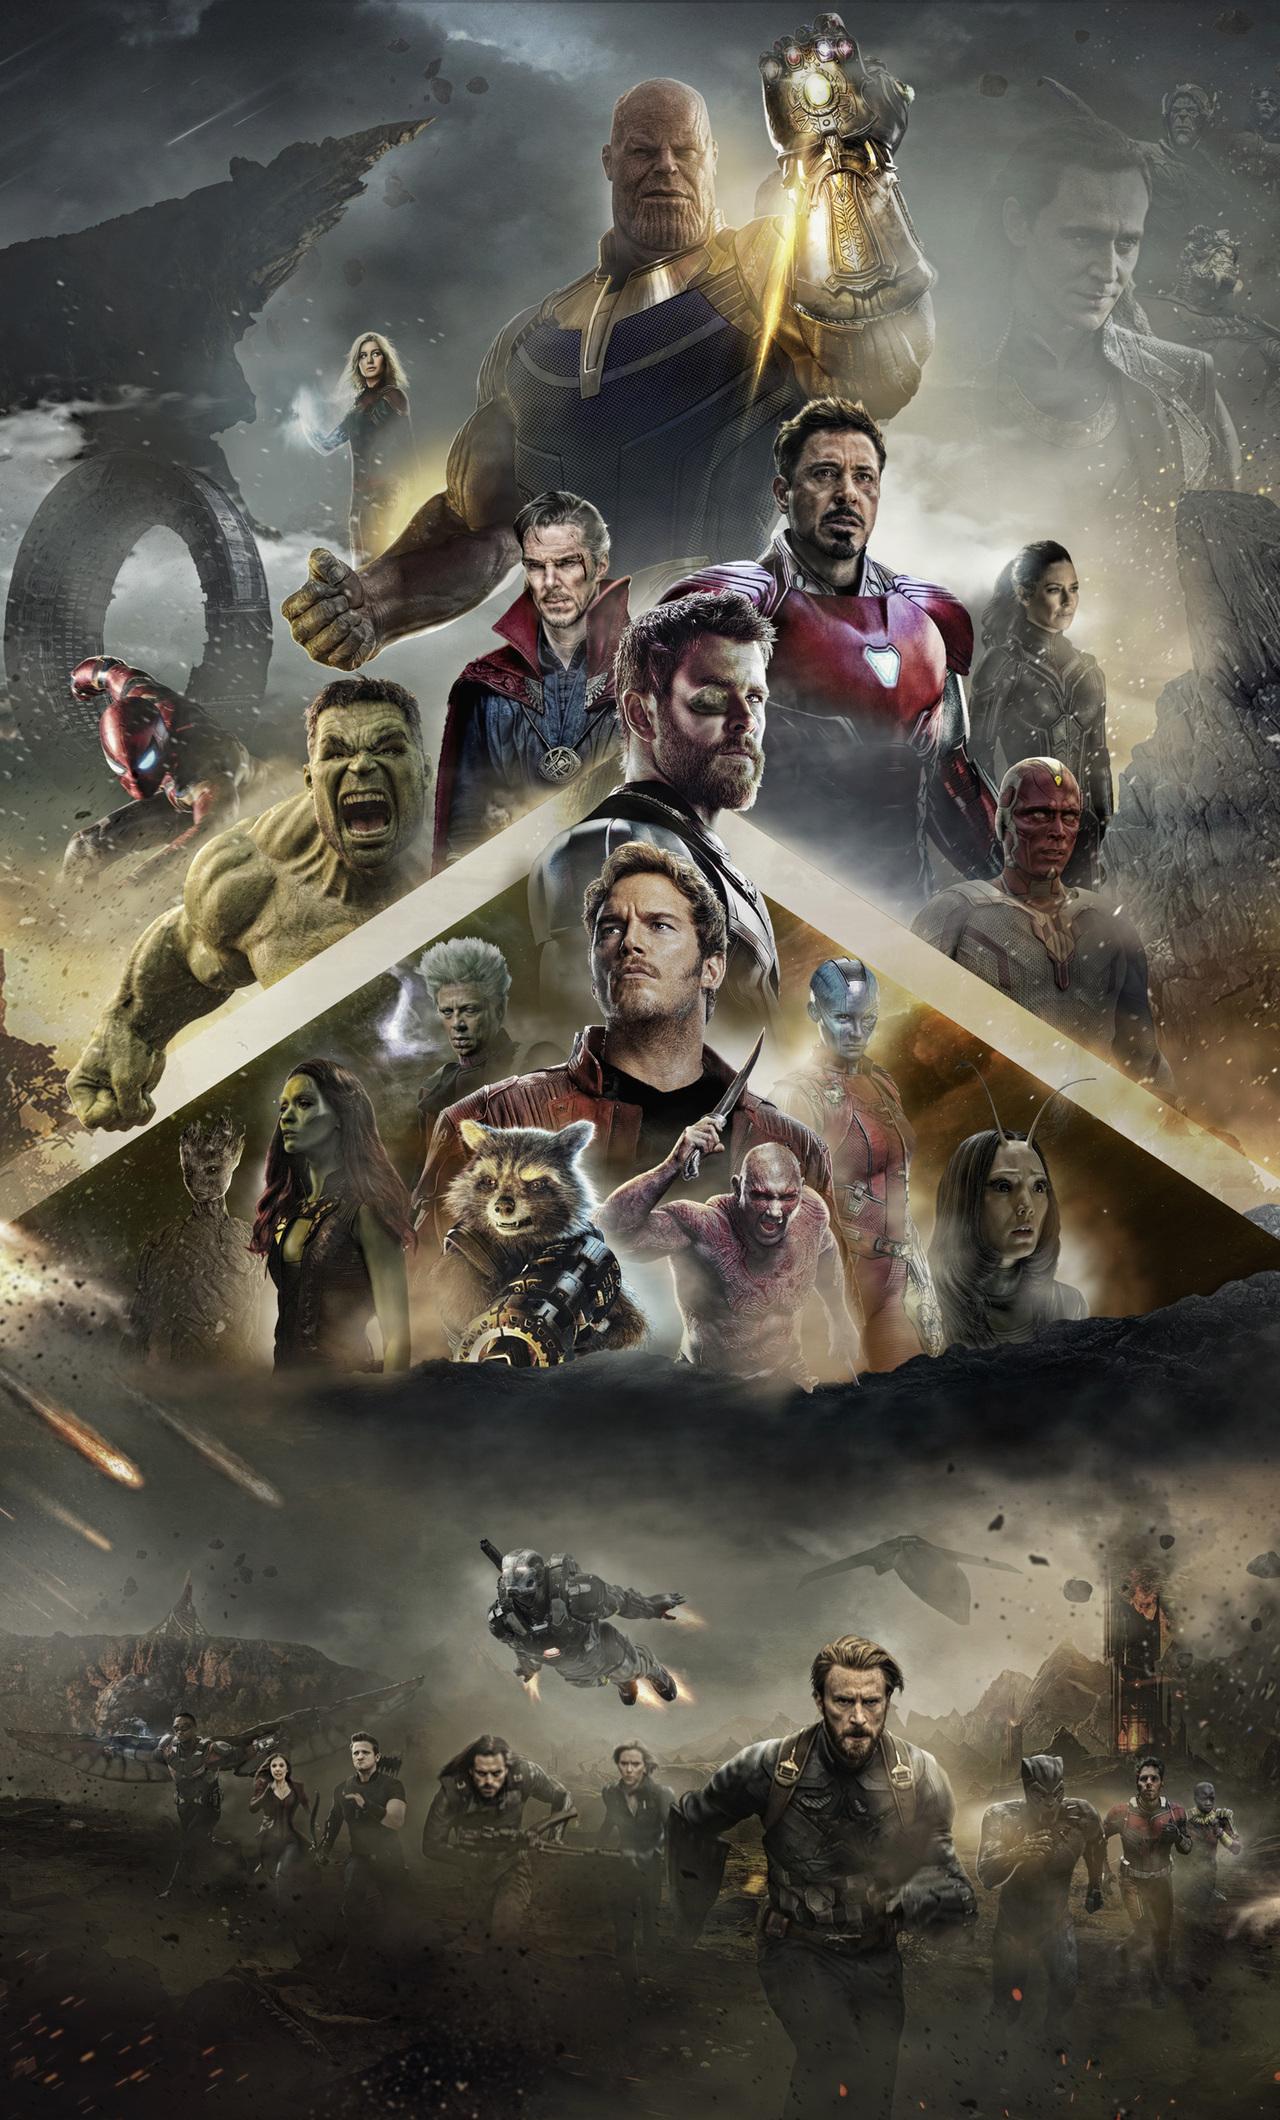 1280x2120 Avengers Infinity War 2018 Poster Iphone 6 Hd 4k